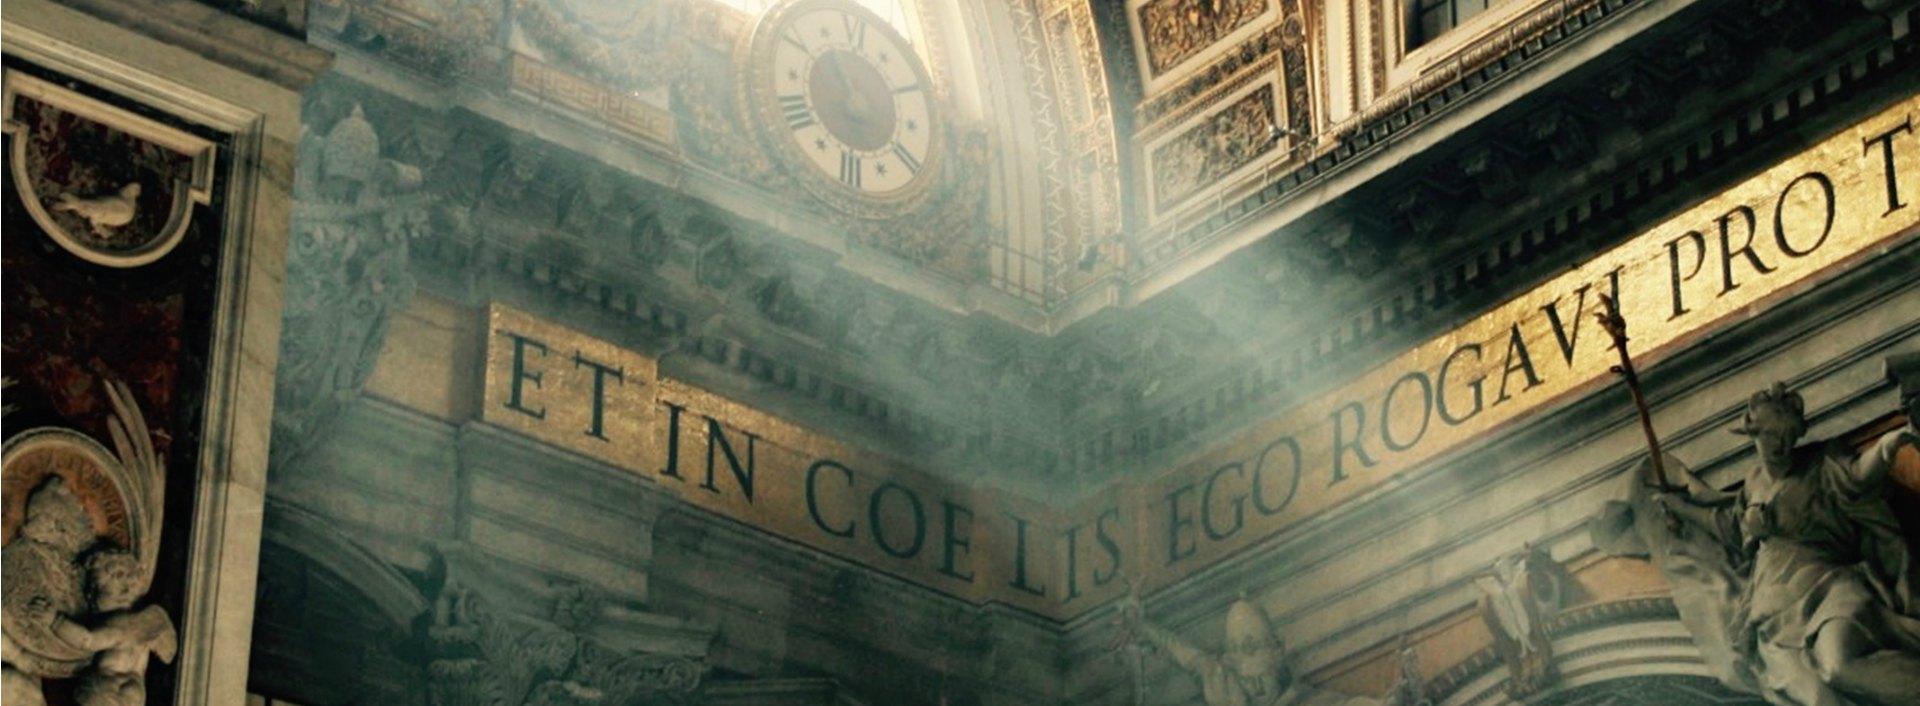 Roman church corner with Latin inscription like i.e. and e.g.